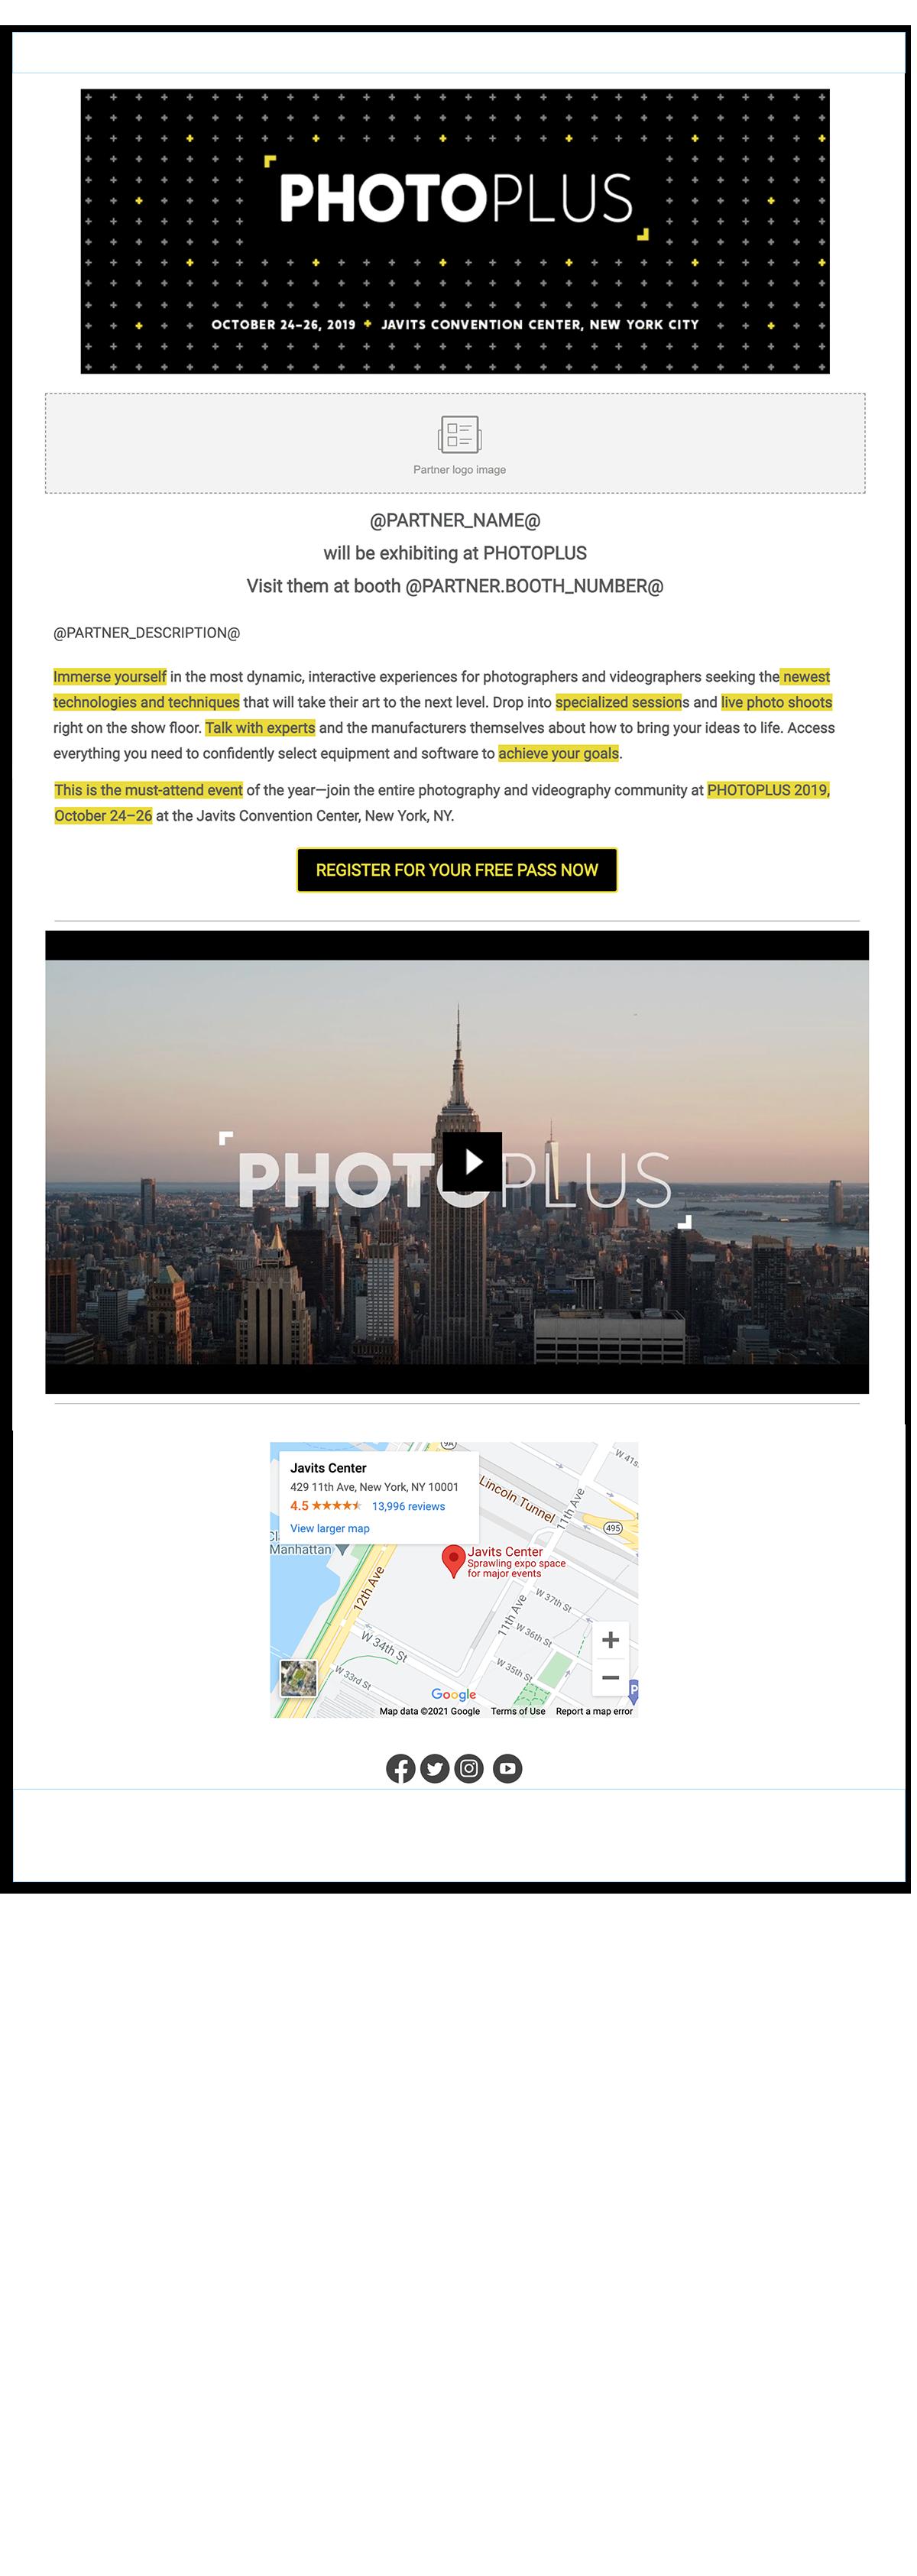 PhotoPlus-landing-page-template